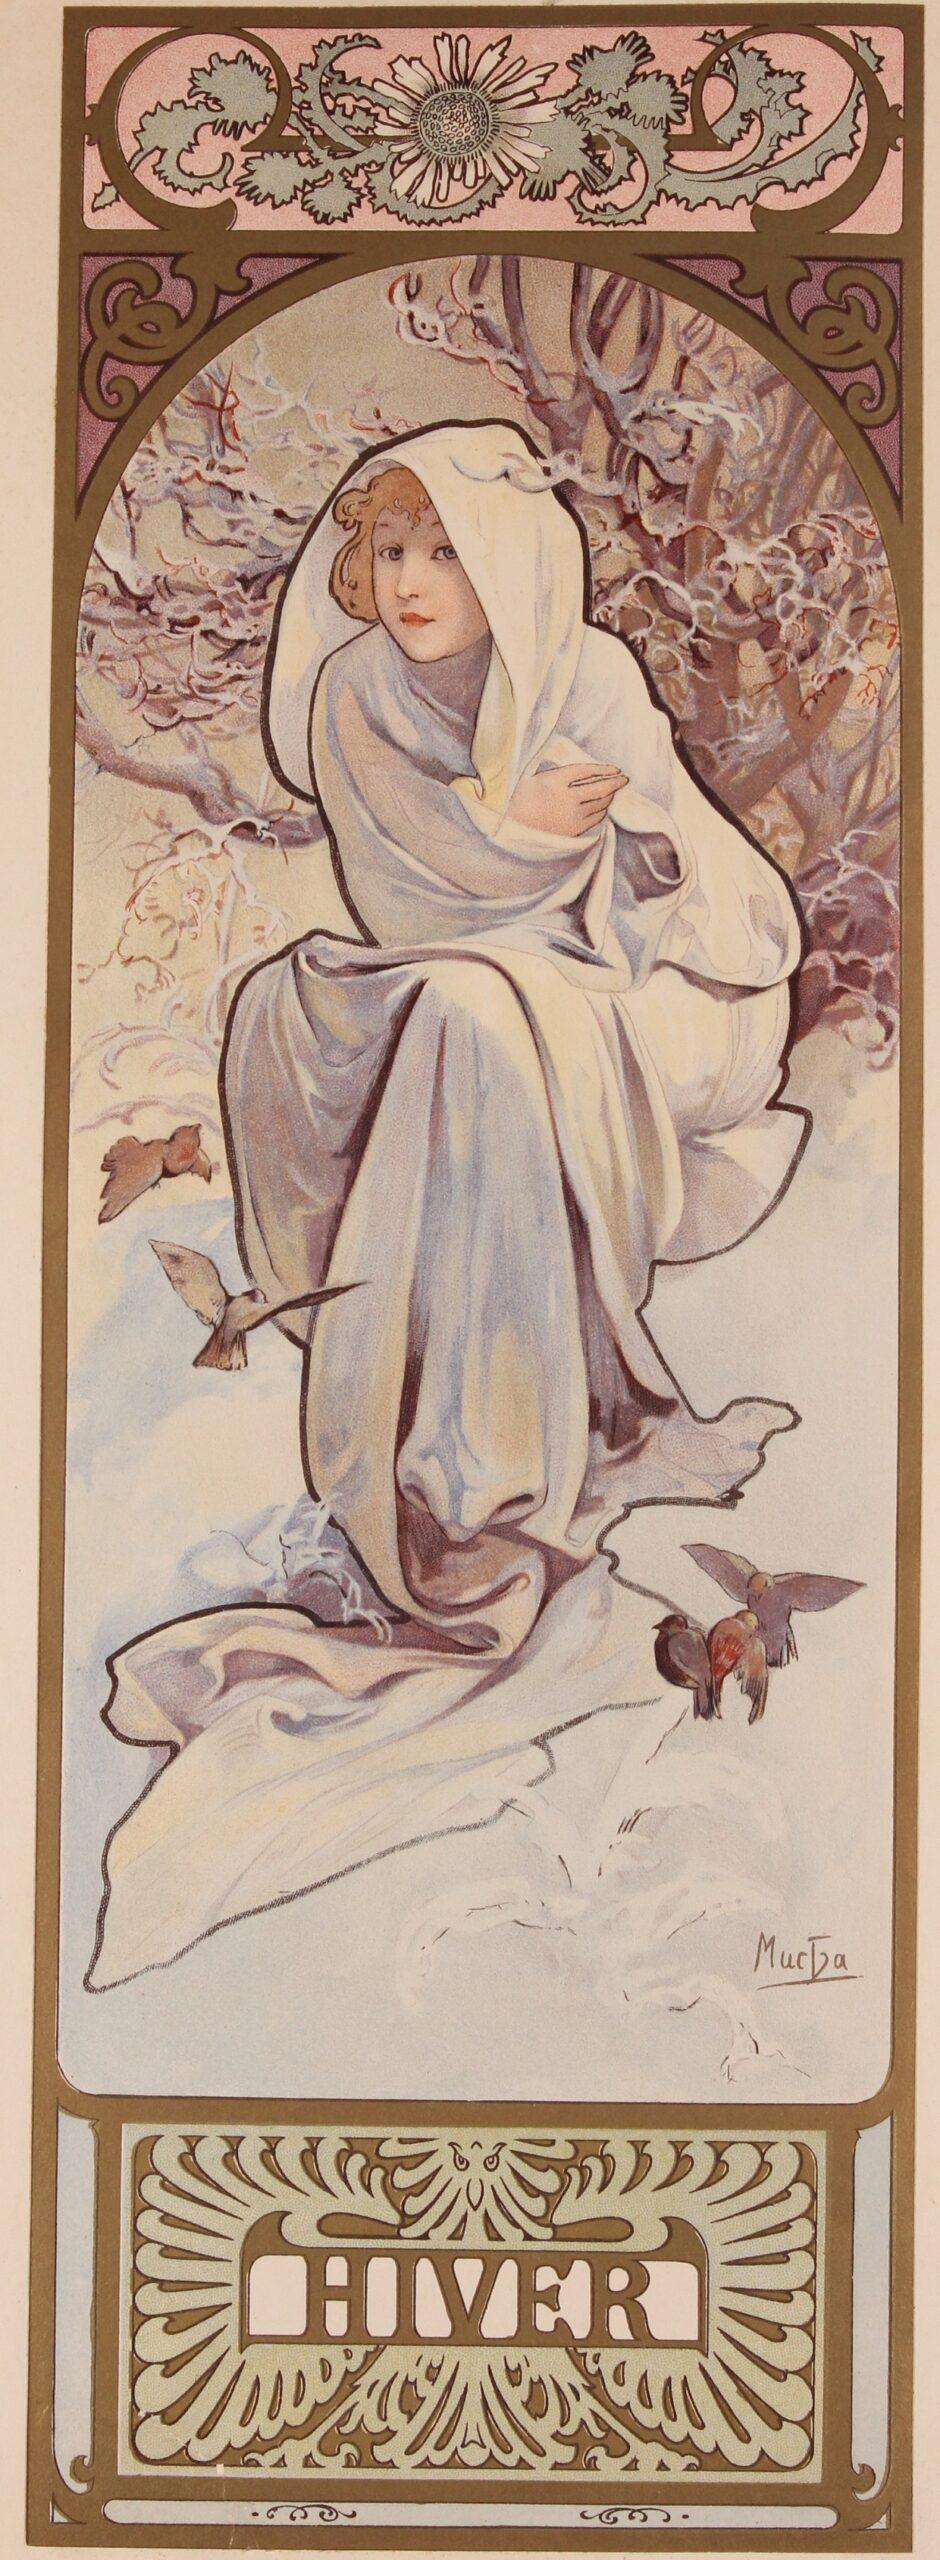 Originele 19e-eeuwse litho Alphonse Mucha